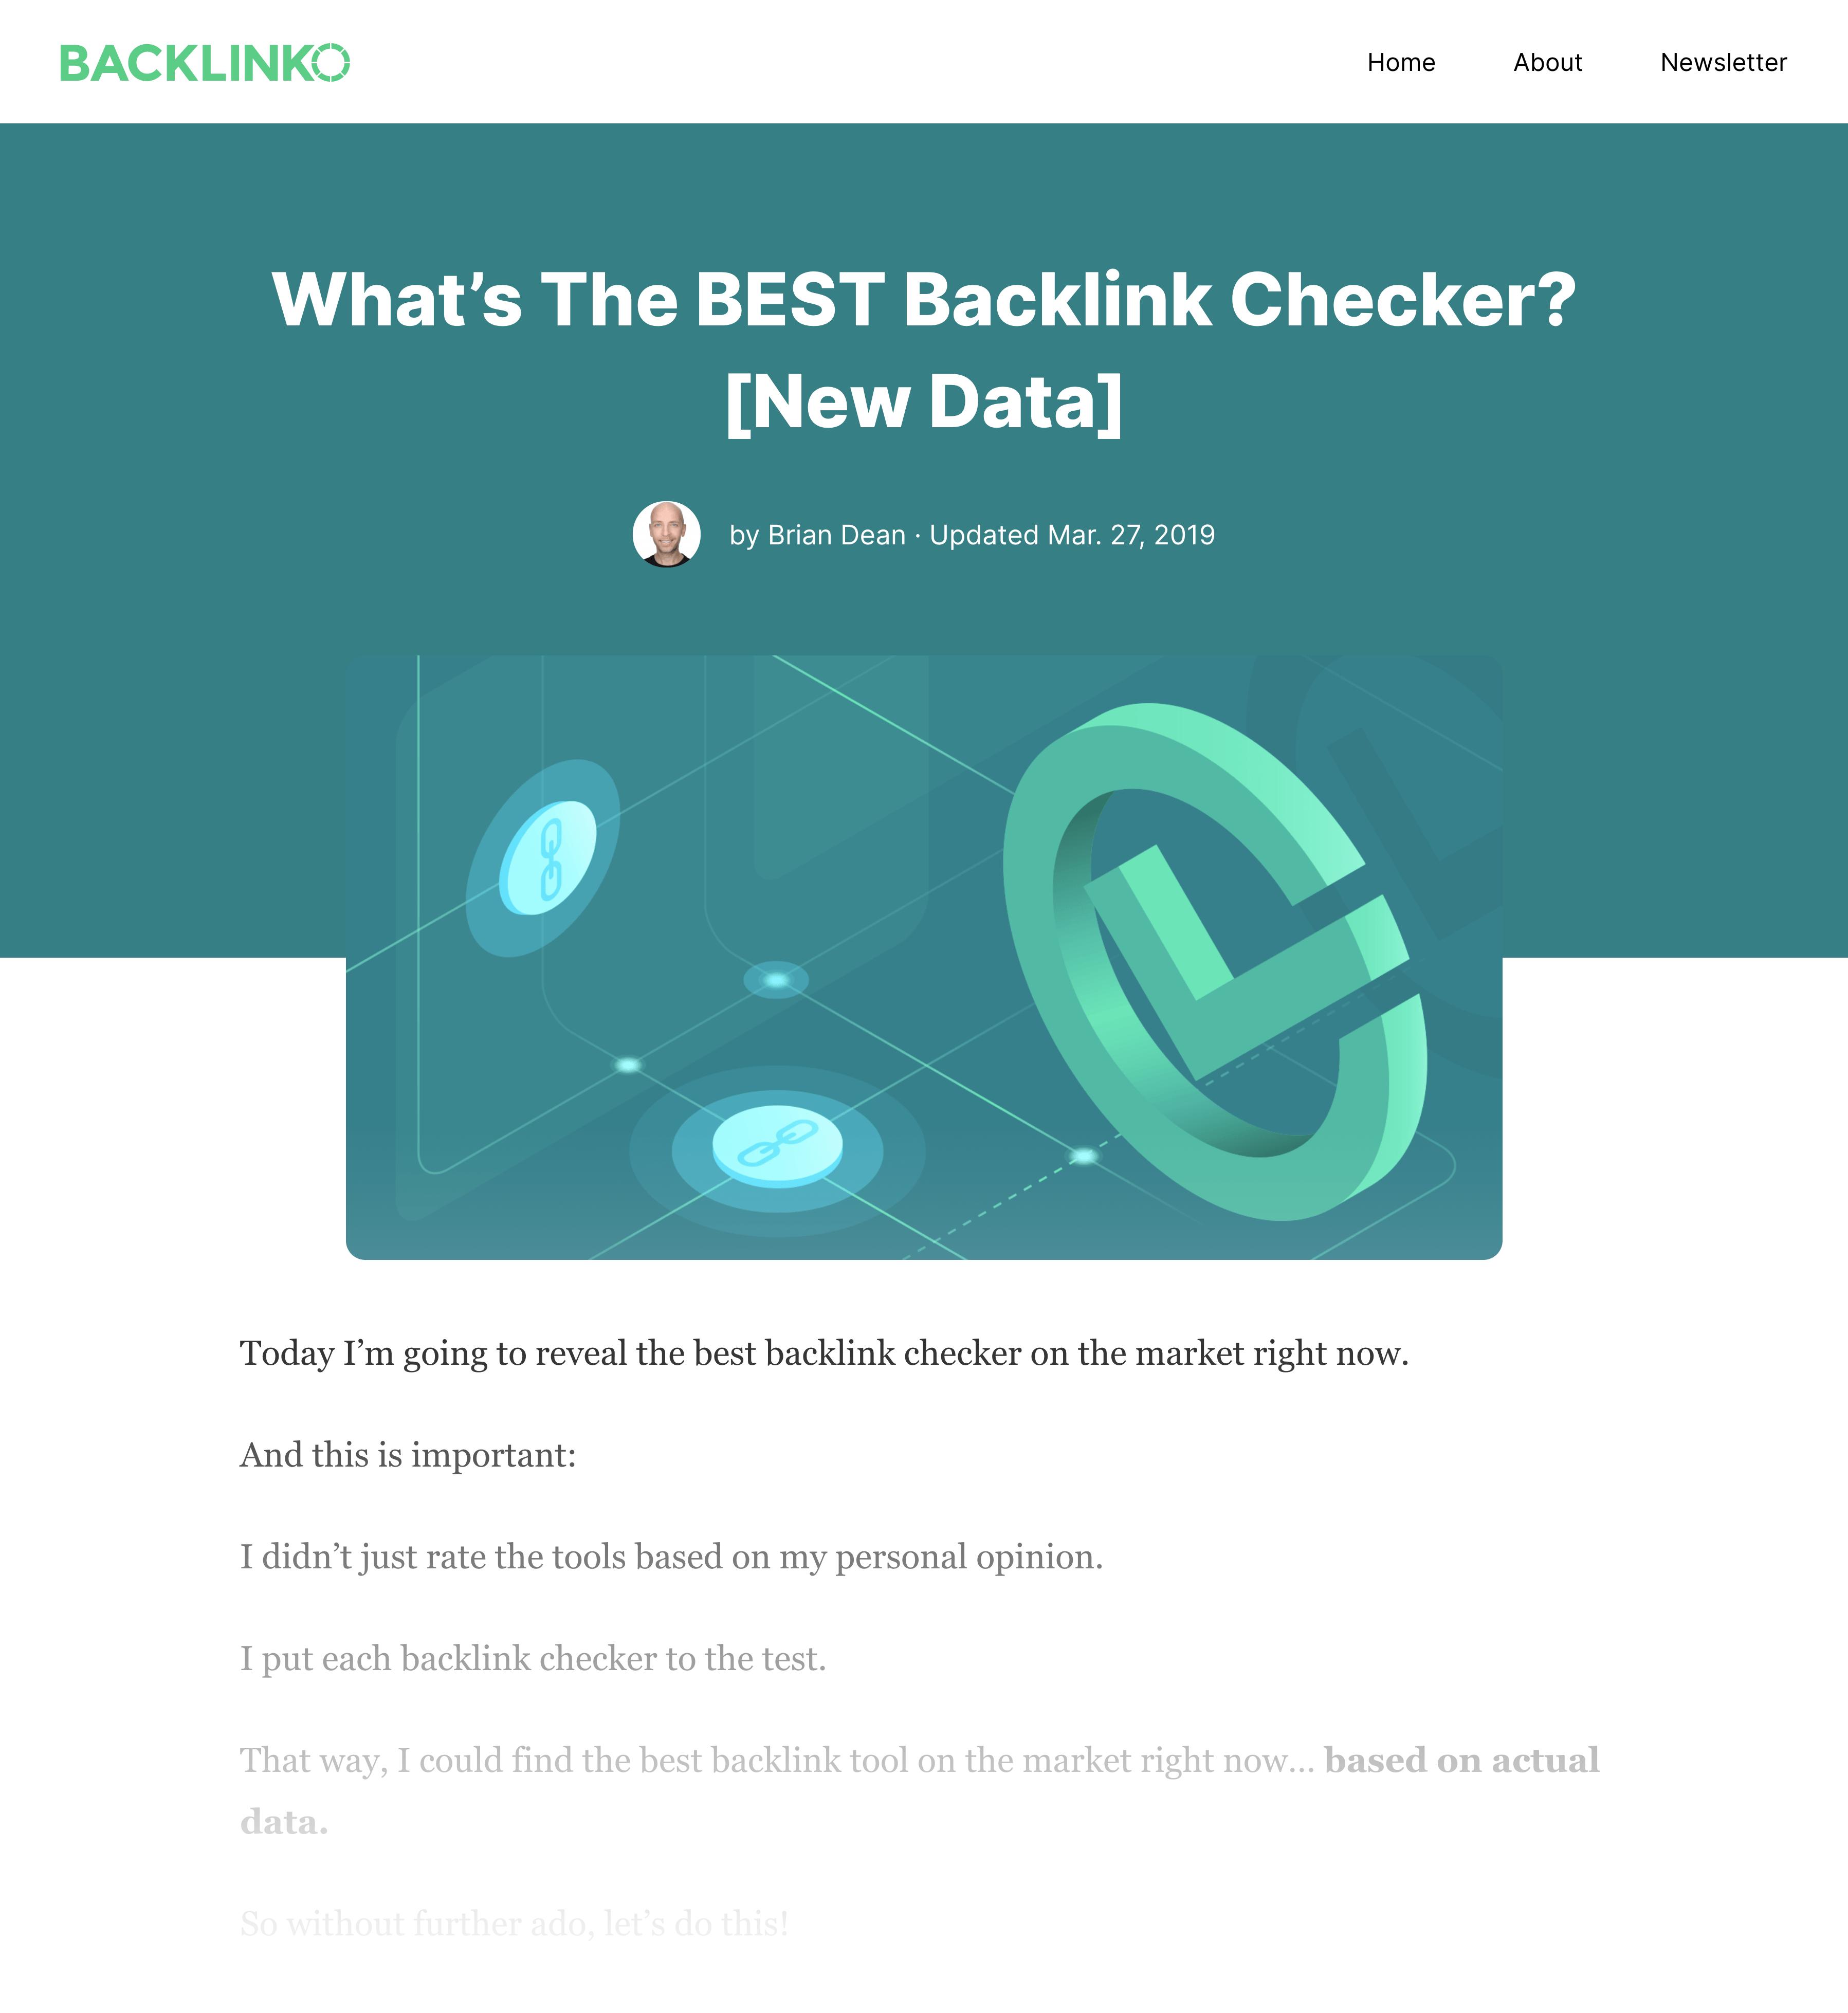 Best Backlink Checker Post